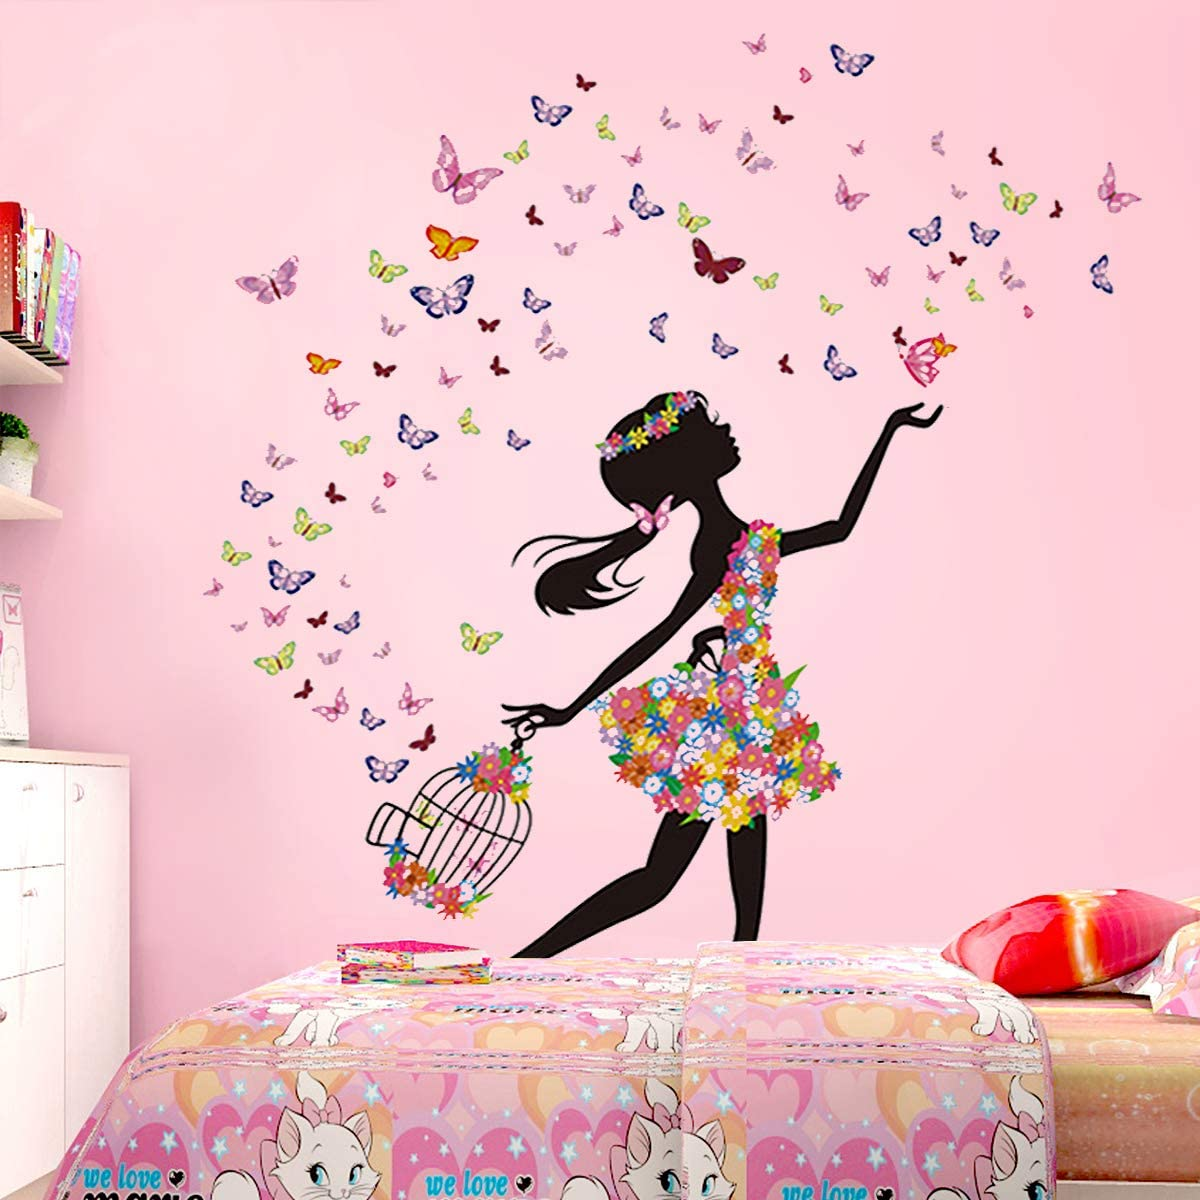 Flowers swirls vinyl wall decal girl room decal w137